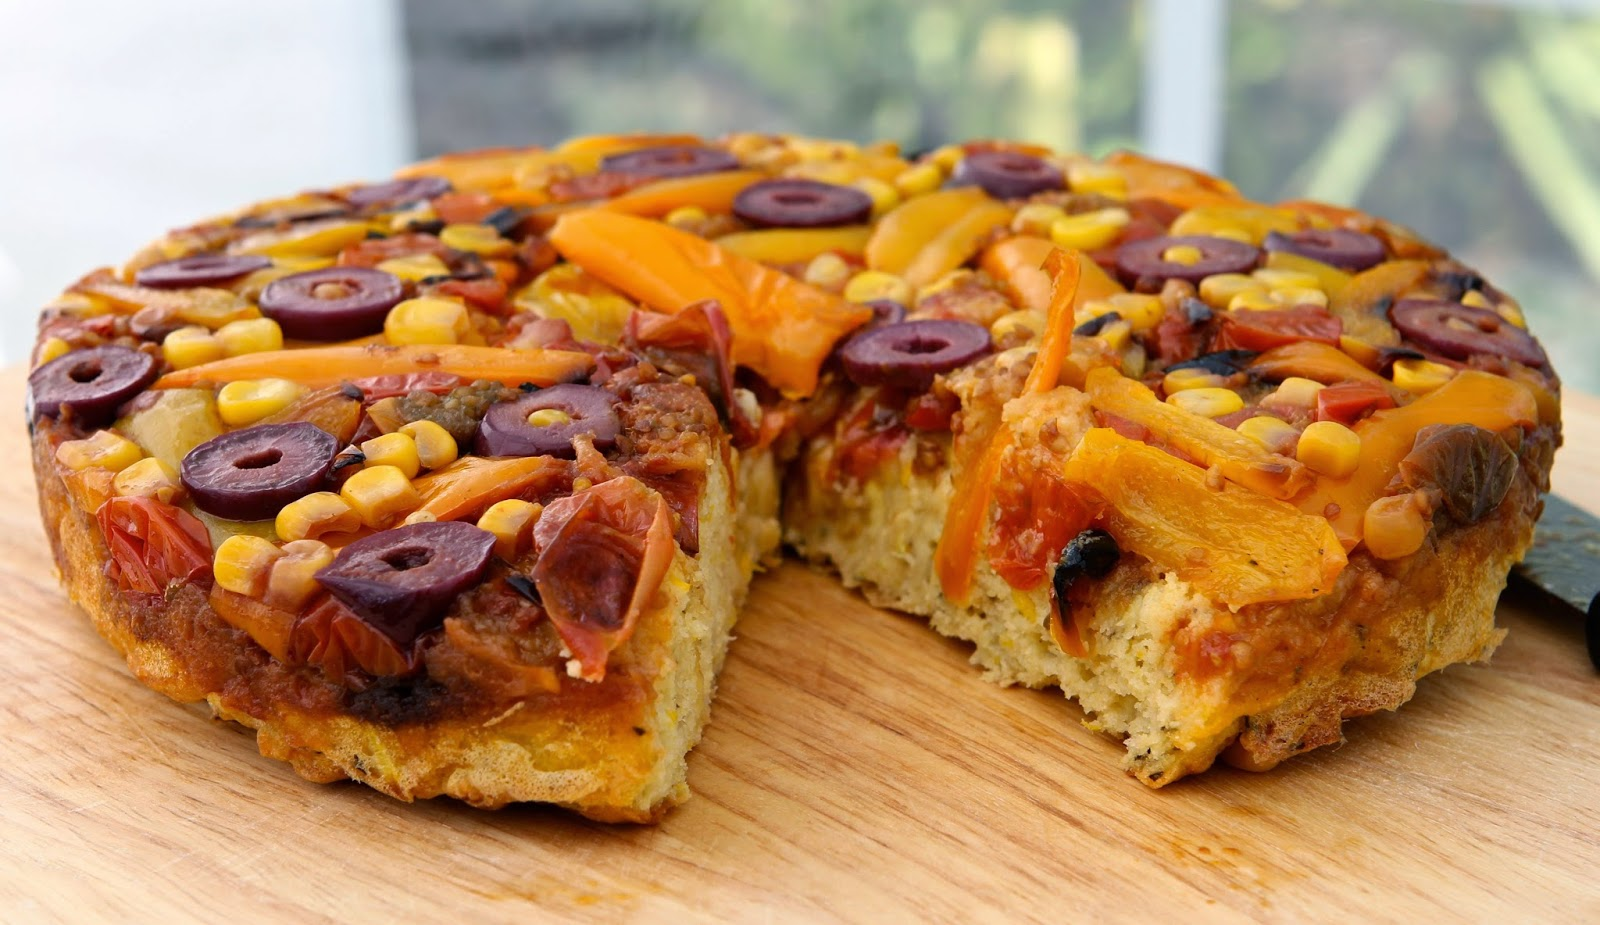 Upside Down Dessert Recipes